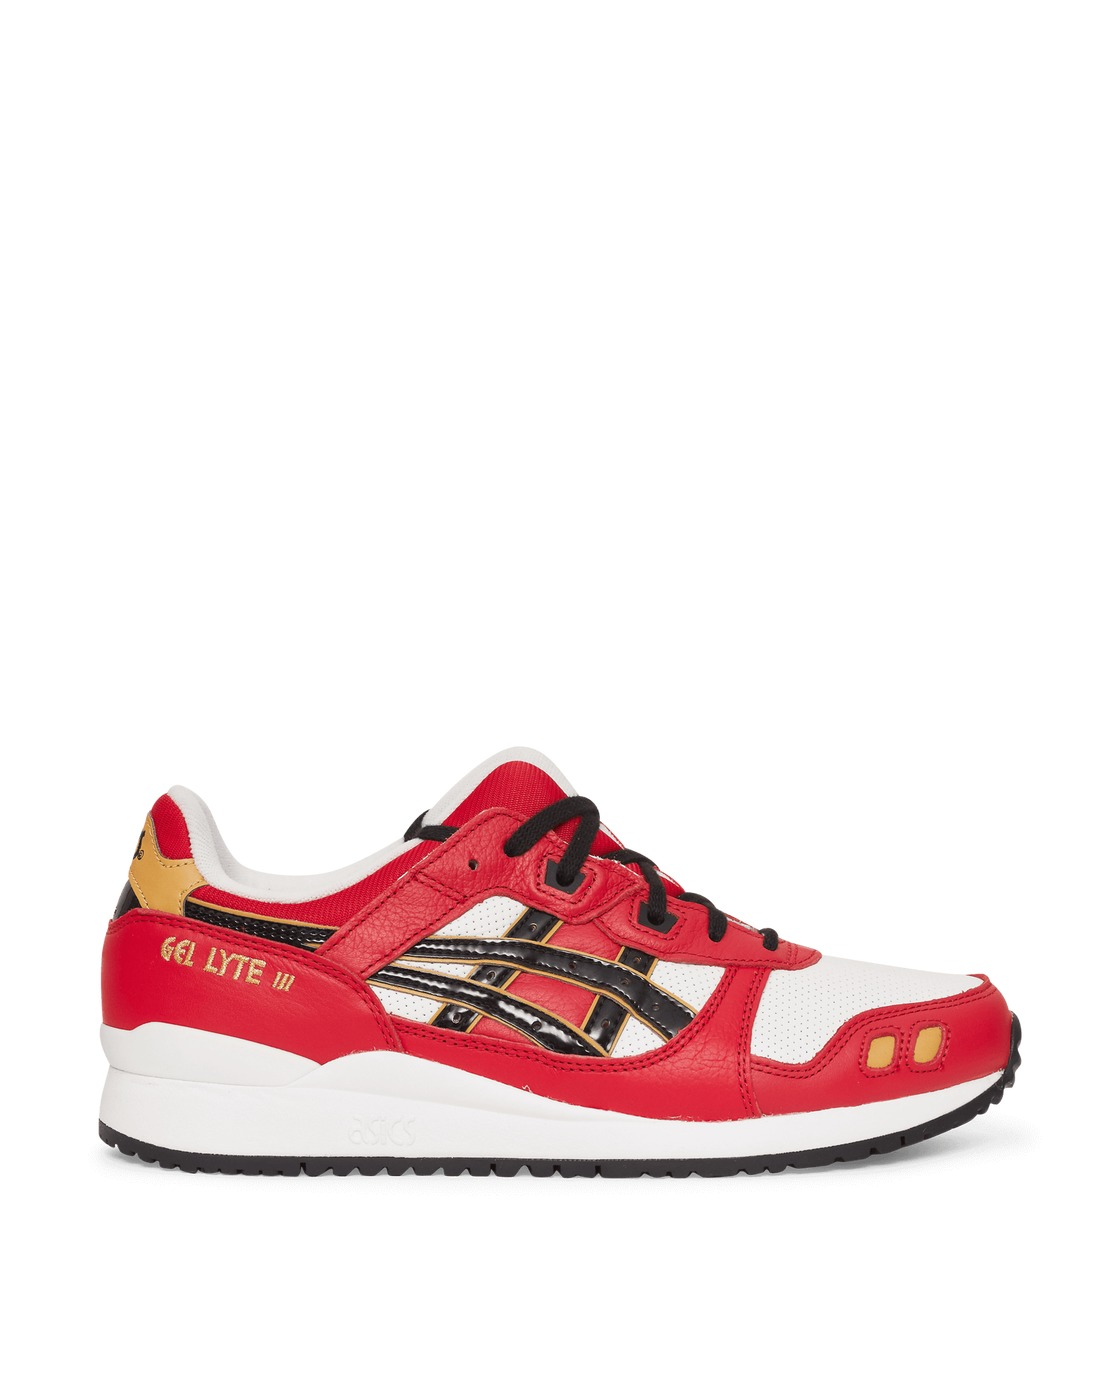 Asics Gel Lyte Iii Og Sneakers Classic Red/Black